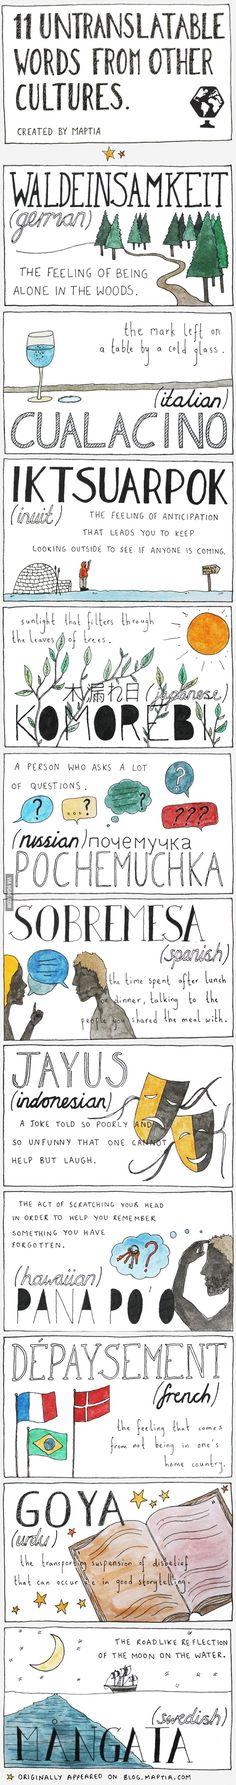 Untranslatable Words